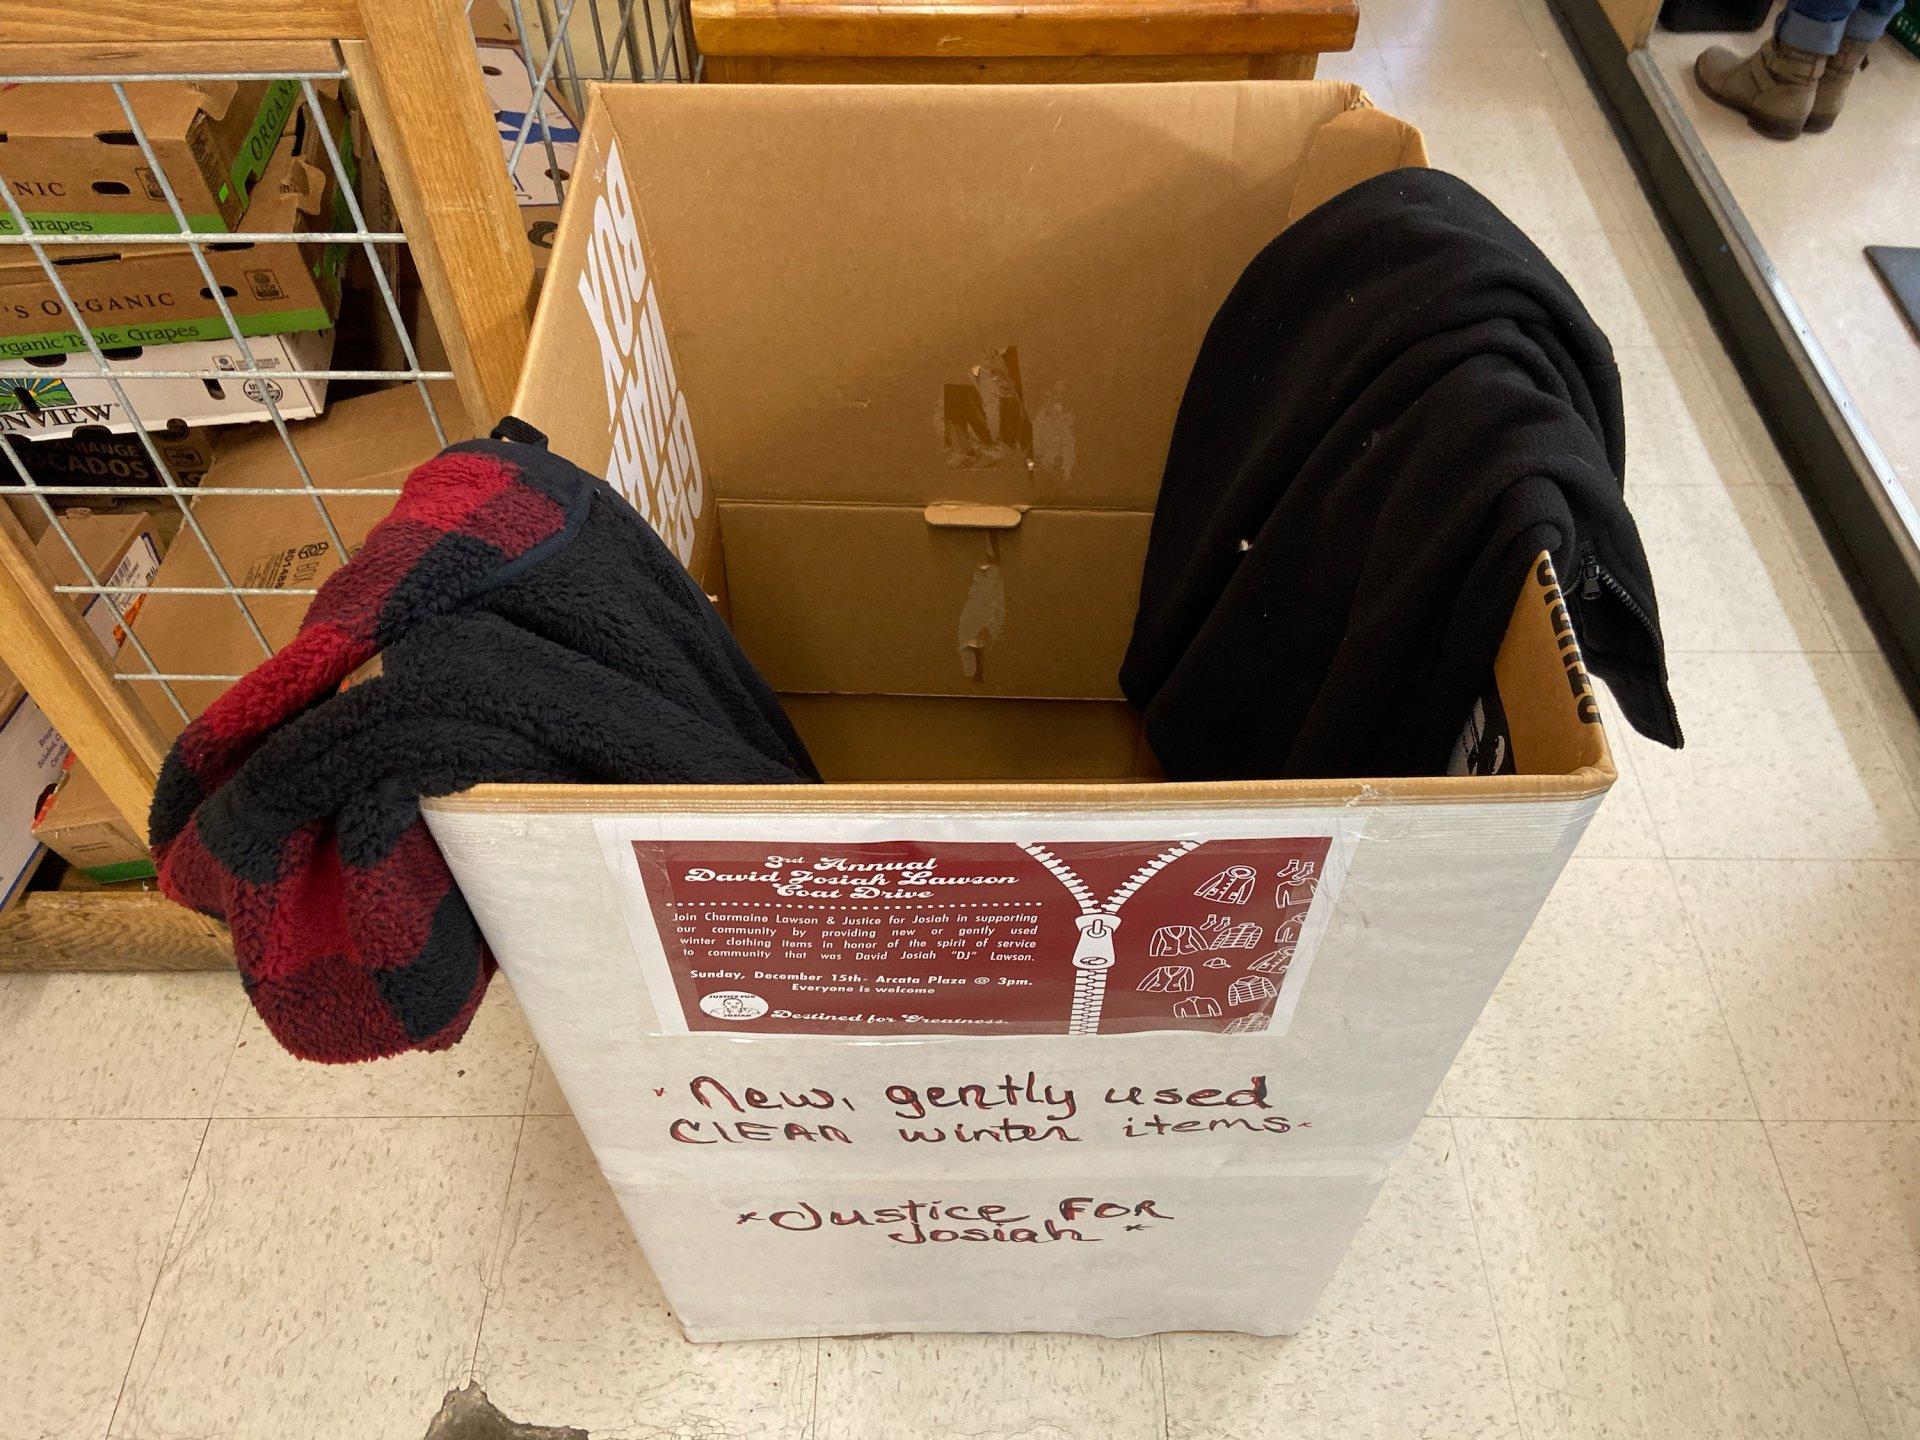 A 3rd Annual David Josiah Lawson Coat Drive drop-off box sits next to the customer service desk at Arcata's North Coast Co-Op. | Photo by Skye Kimya